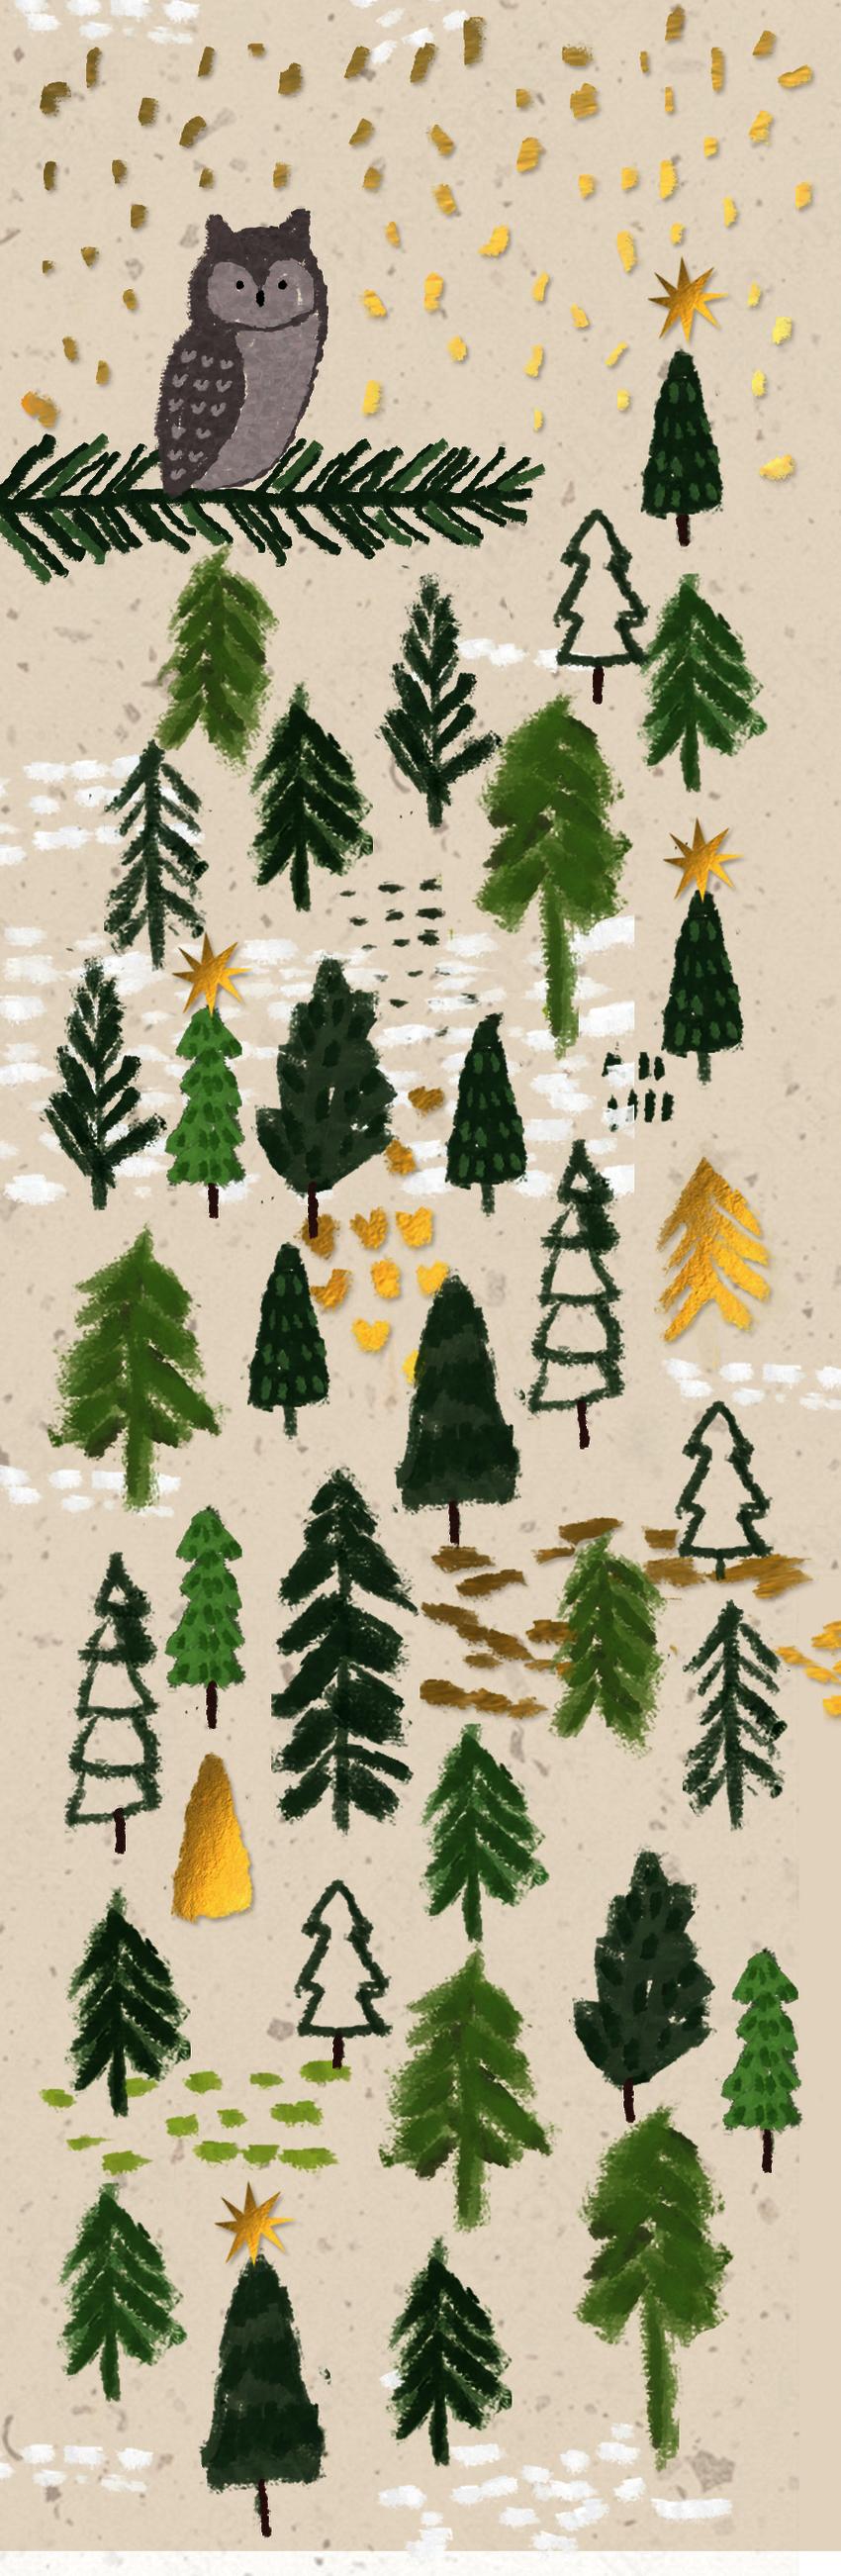 TREES OWL.jpg